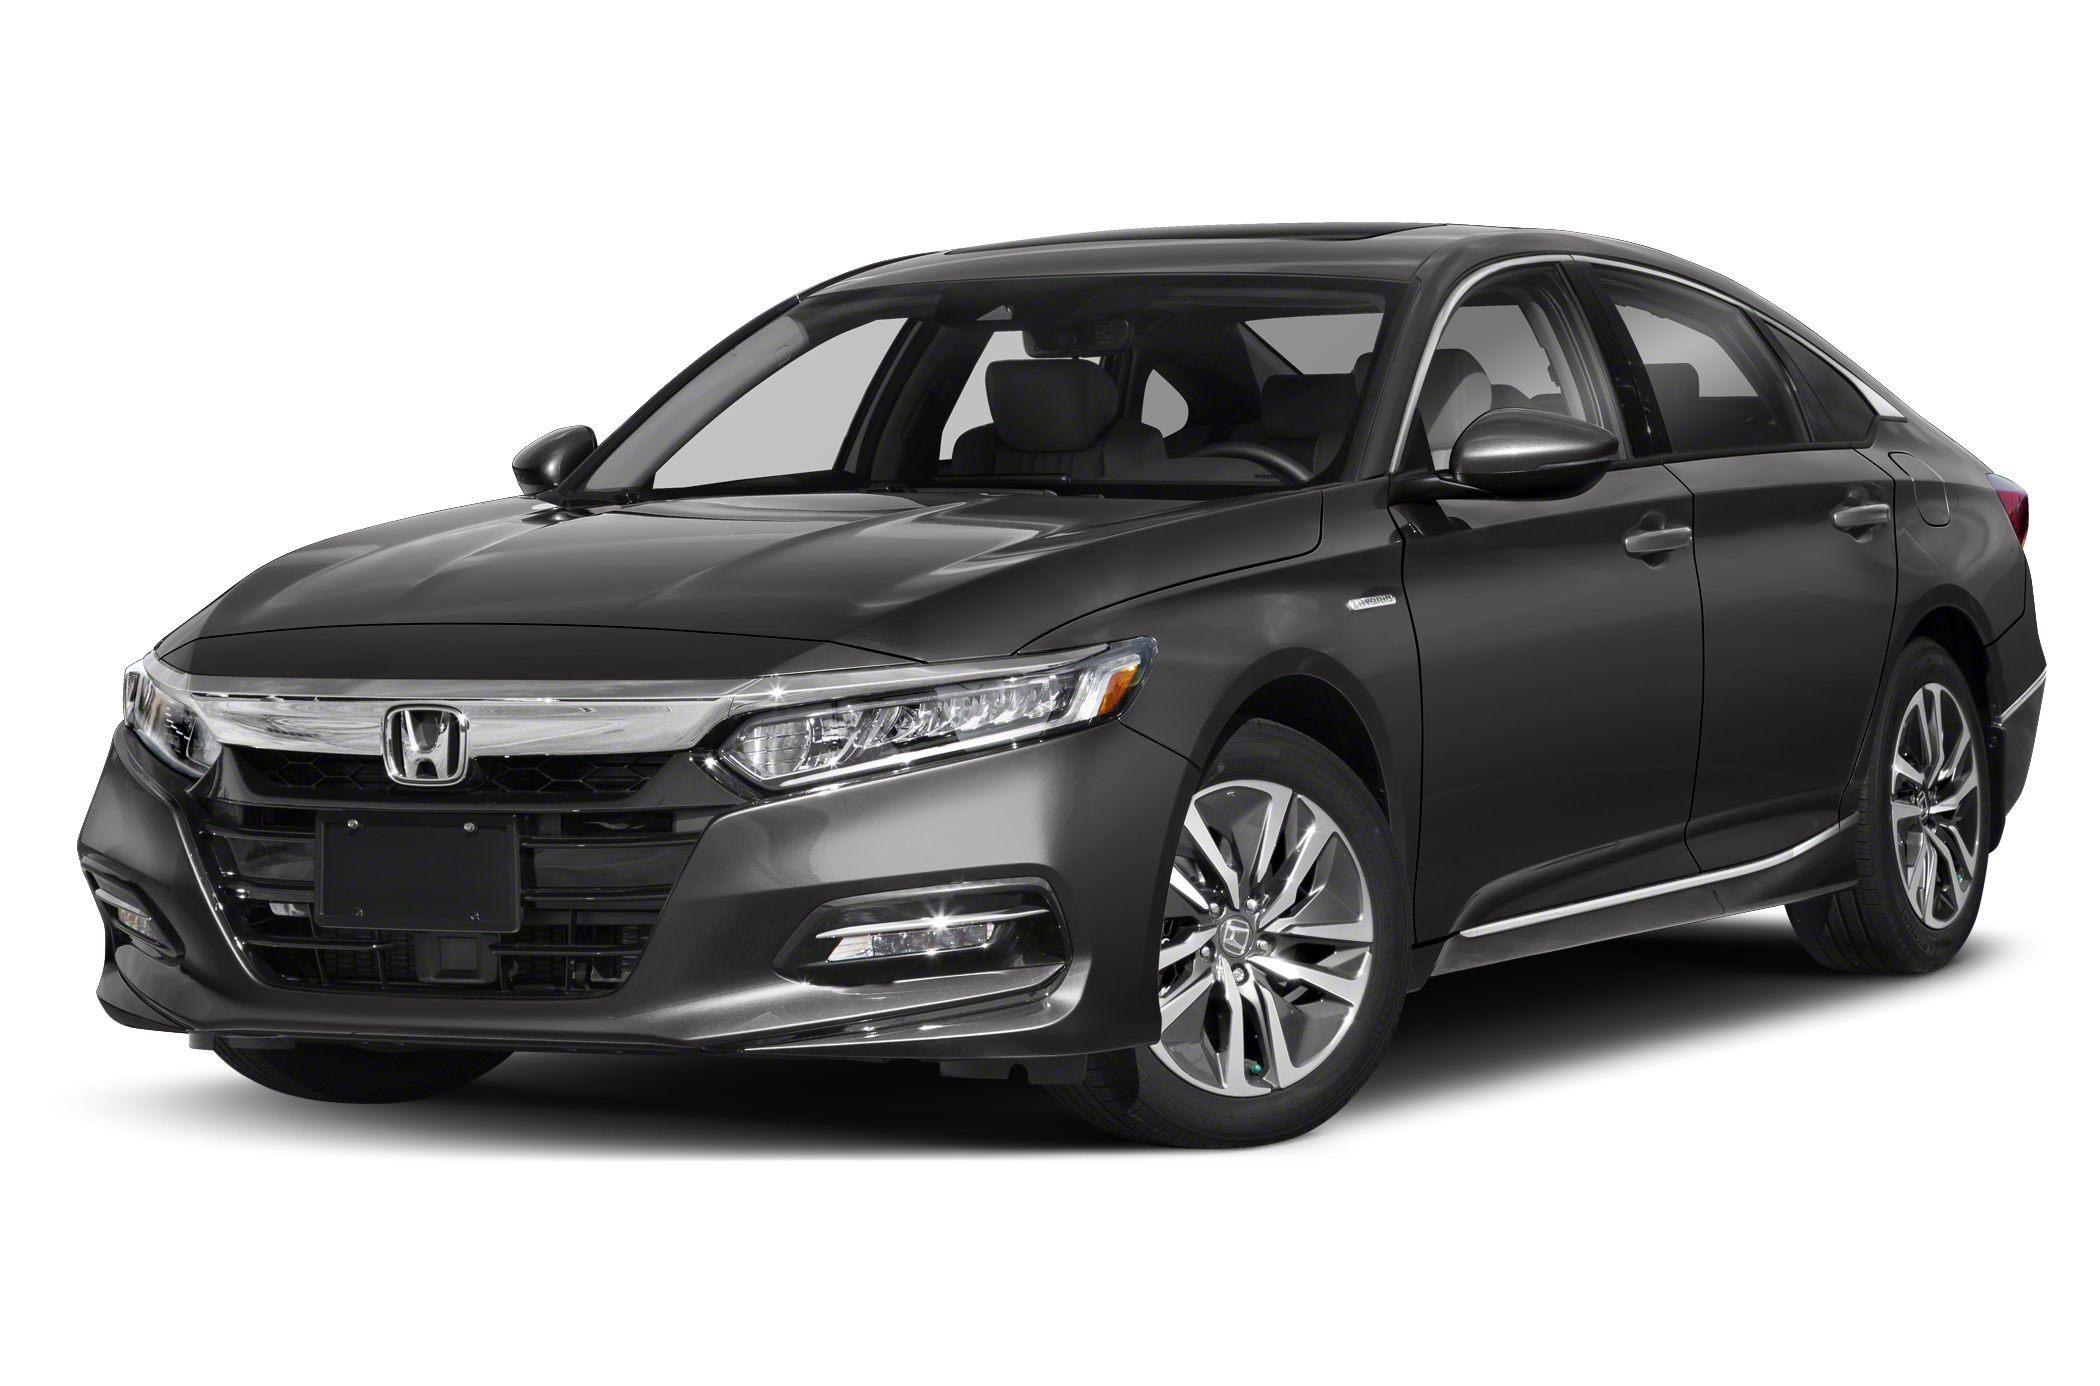 2019 Honda Accord Hybrid EX-L 4dr Sedan